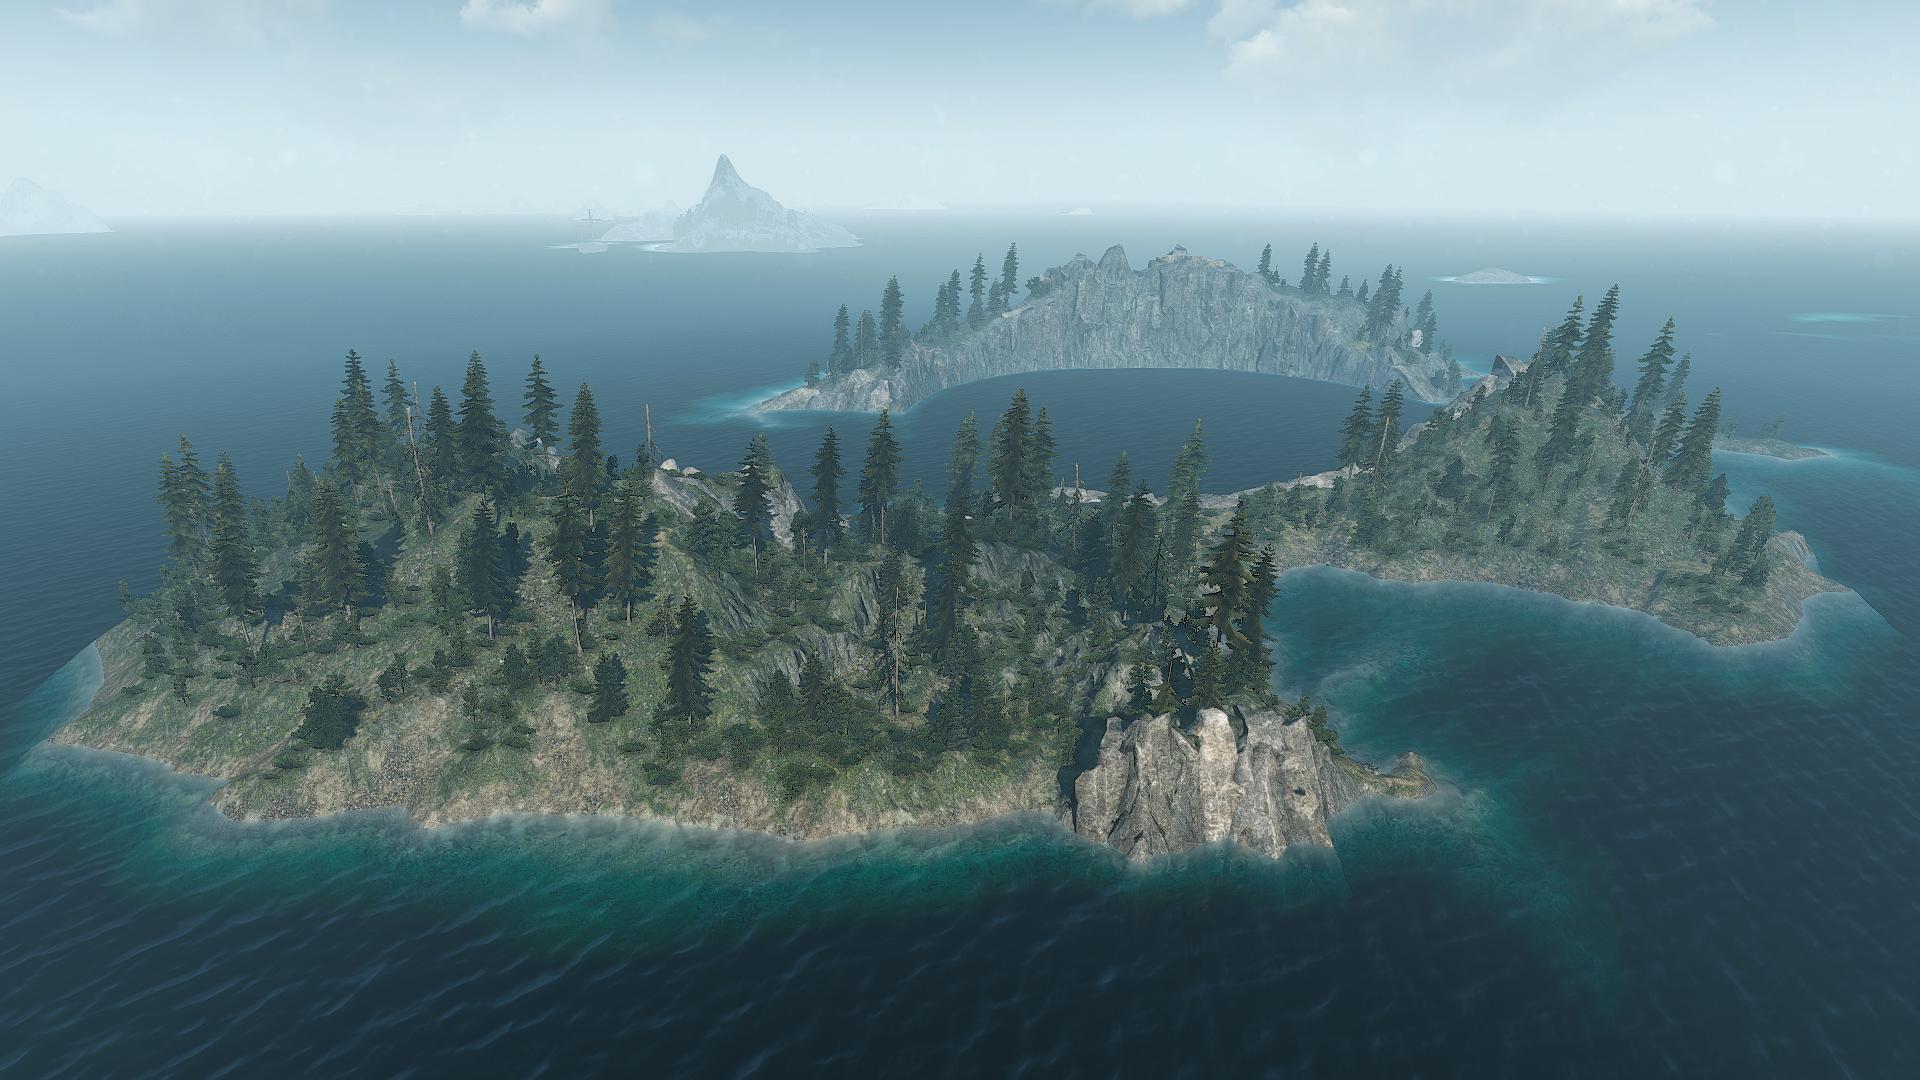 Ingdalen Isle